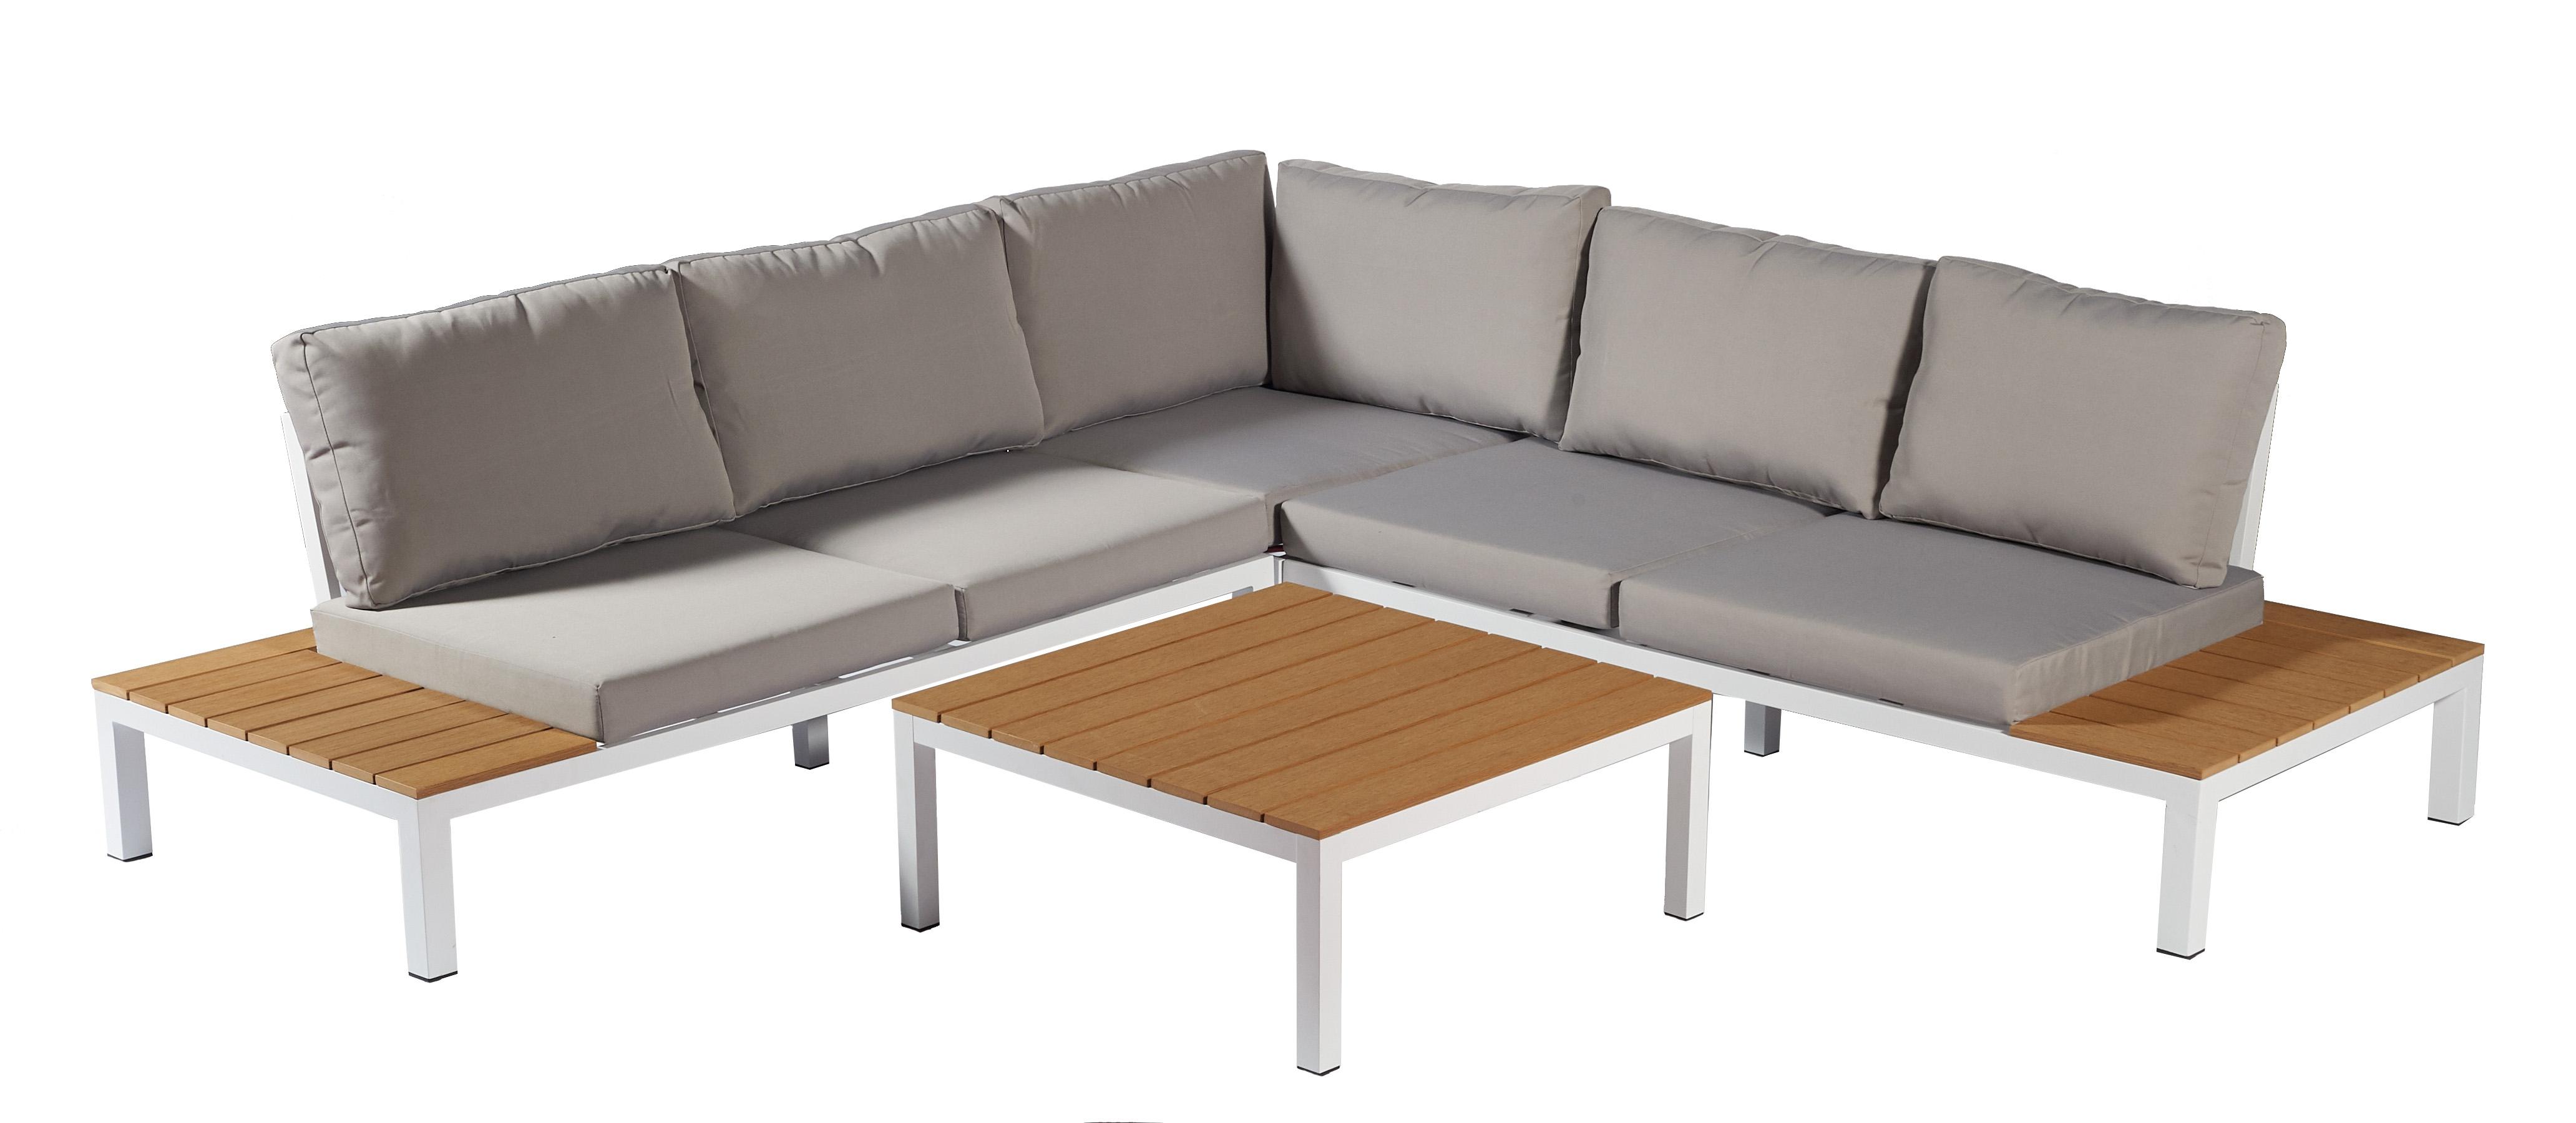 Salon d\'angle de jardin avec table Isa - Mr.Bricolage